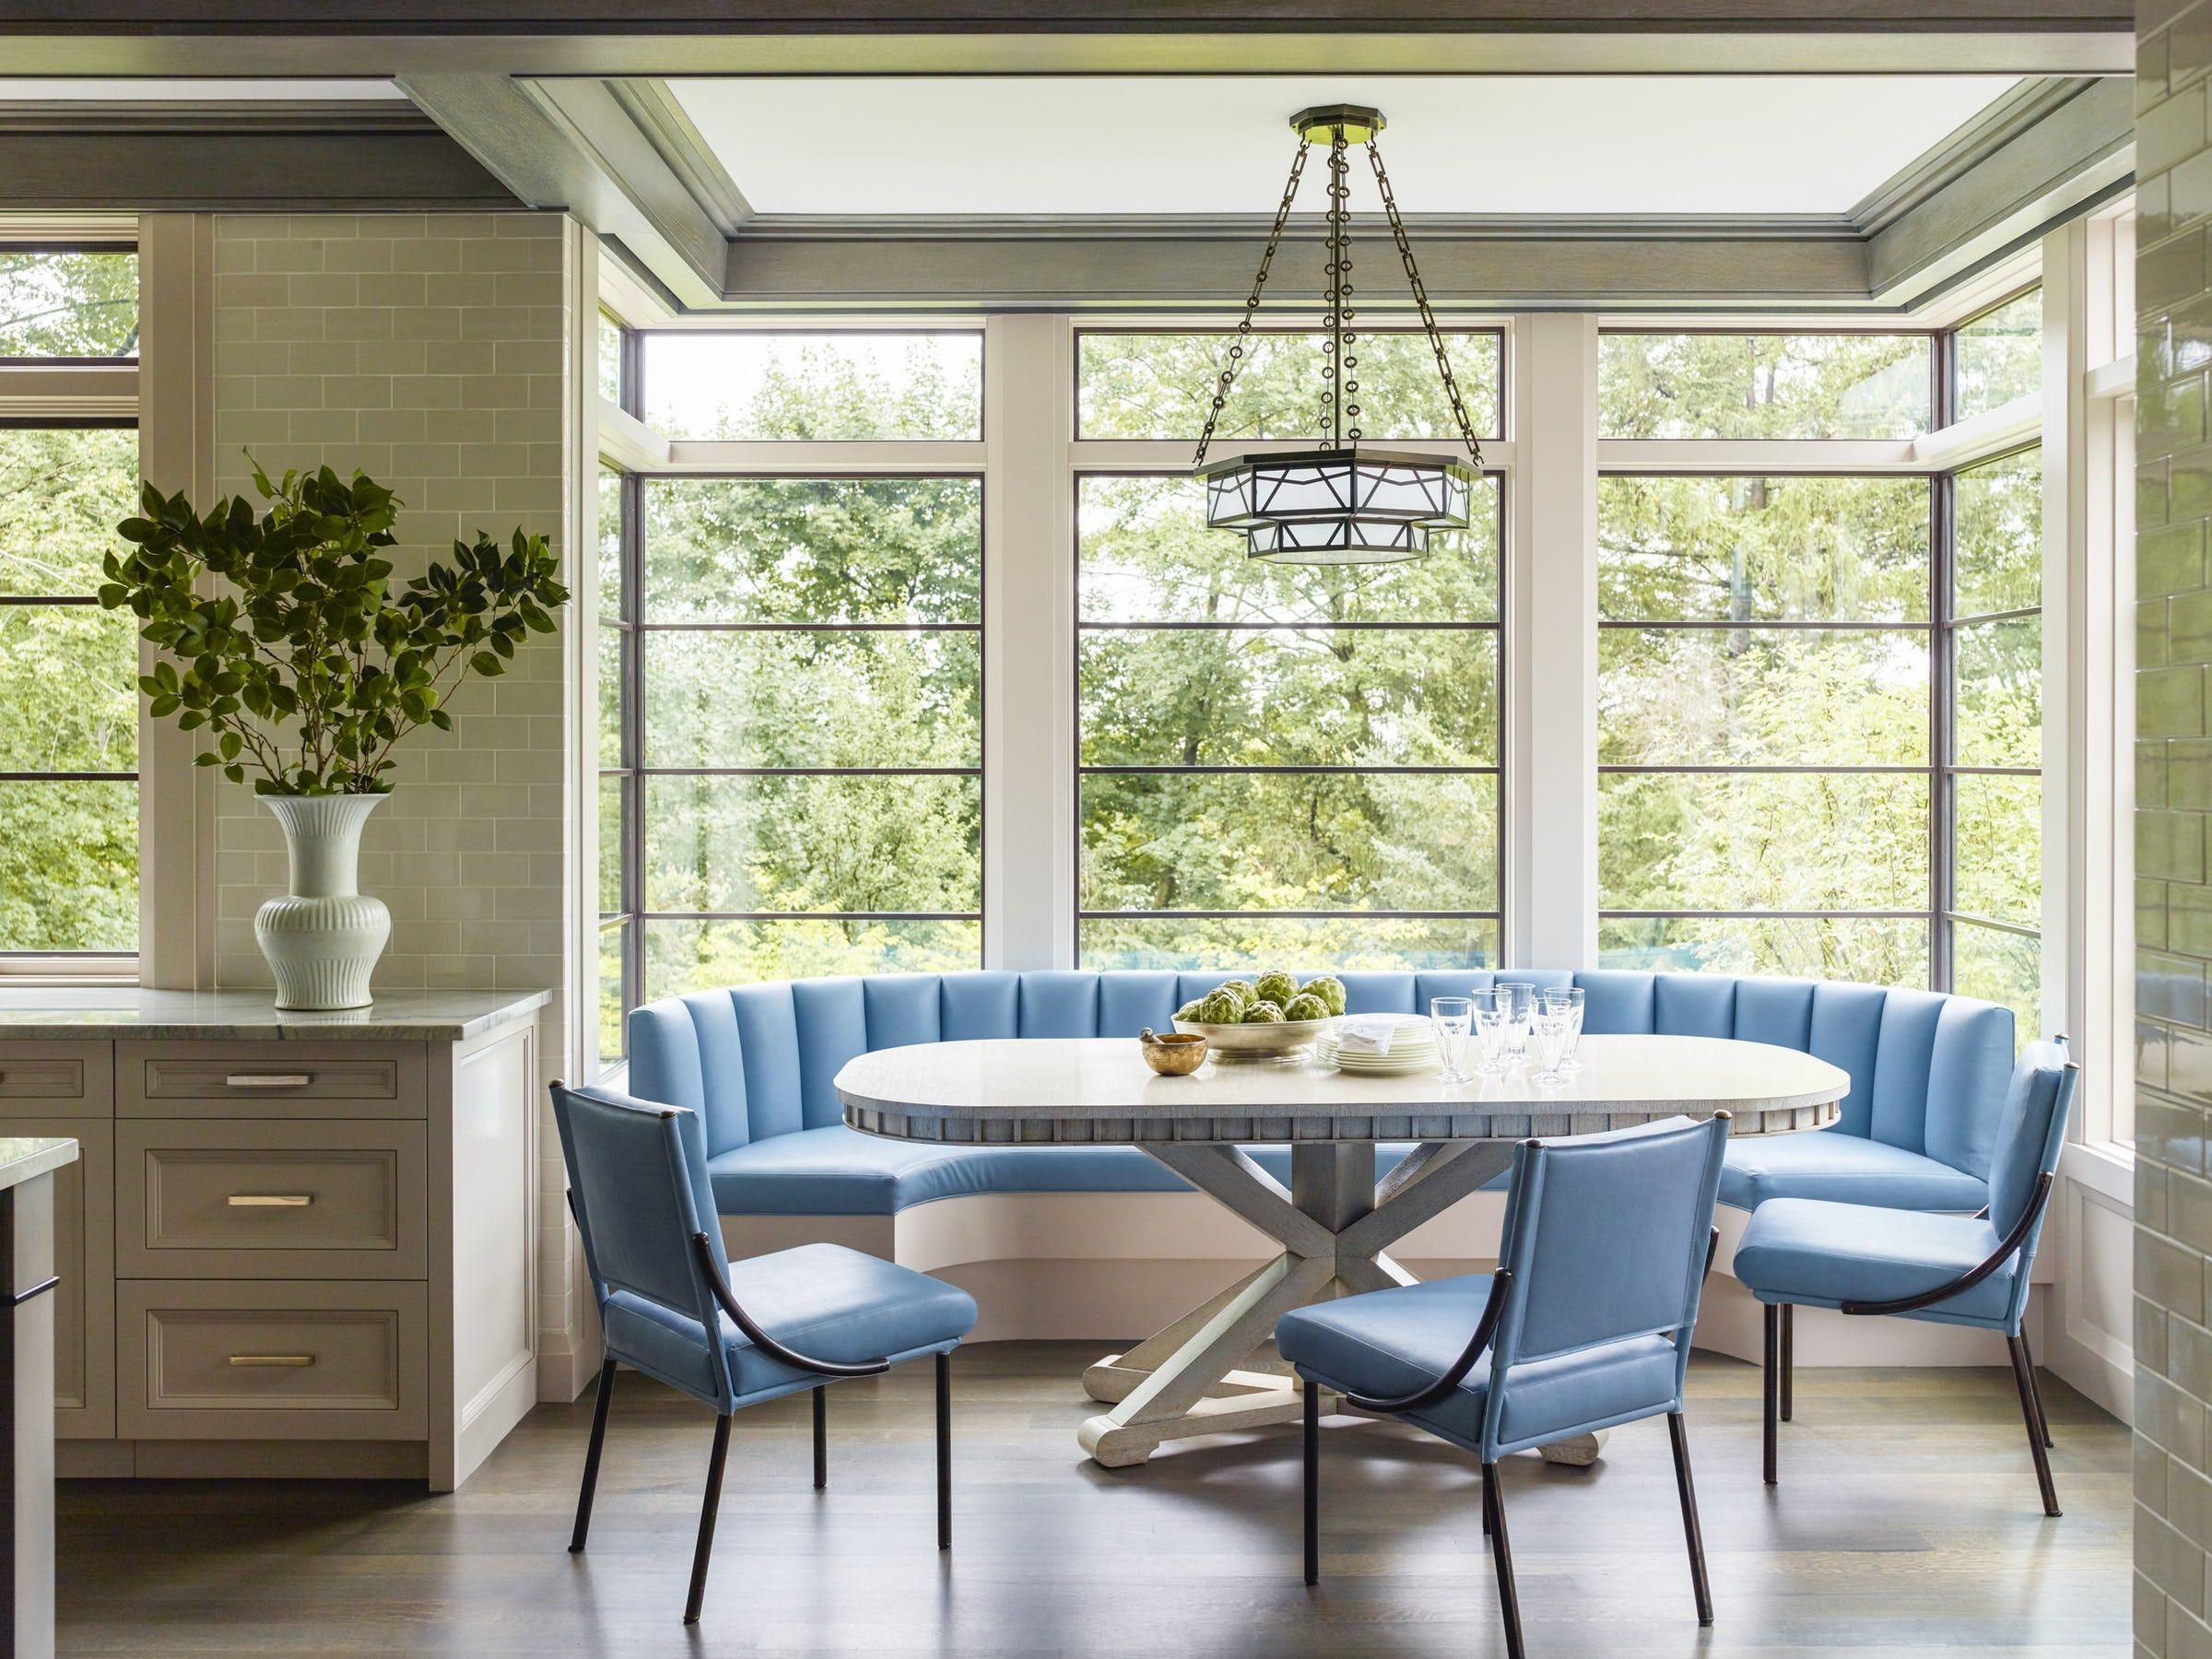 25 Charming Kitchen Banquette Ideas Gorgeous Banquette Seating Photos